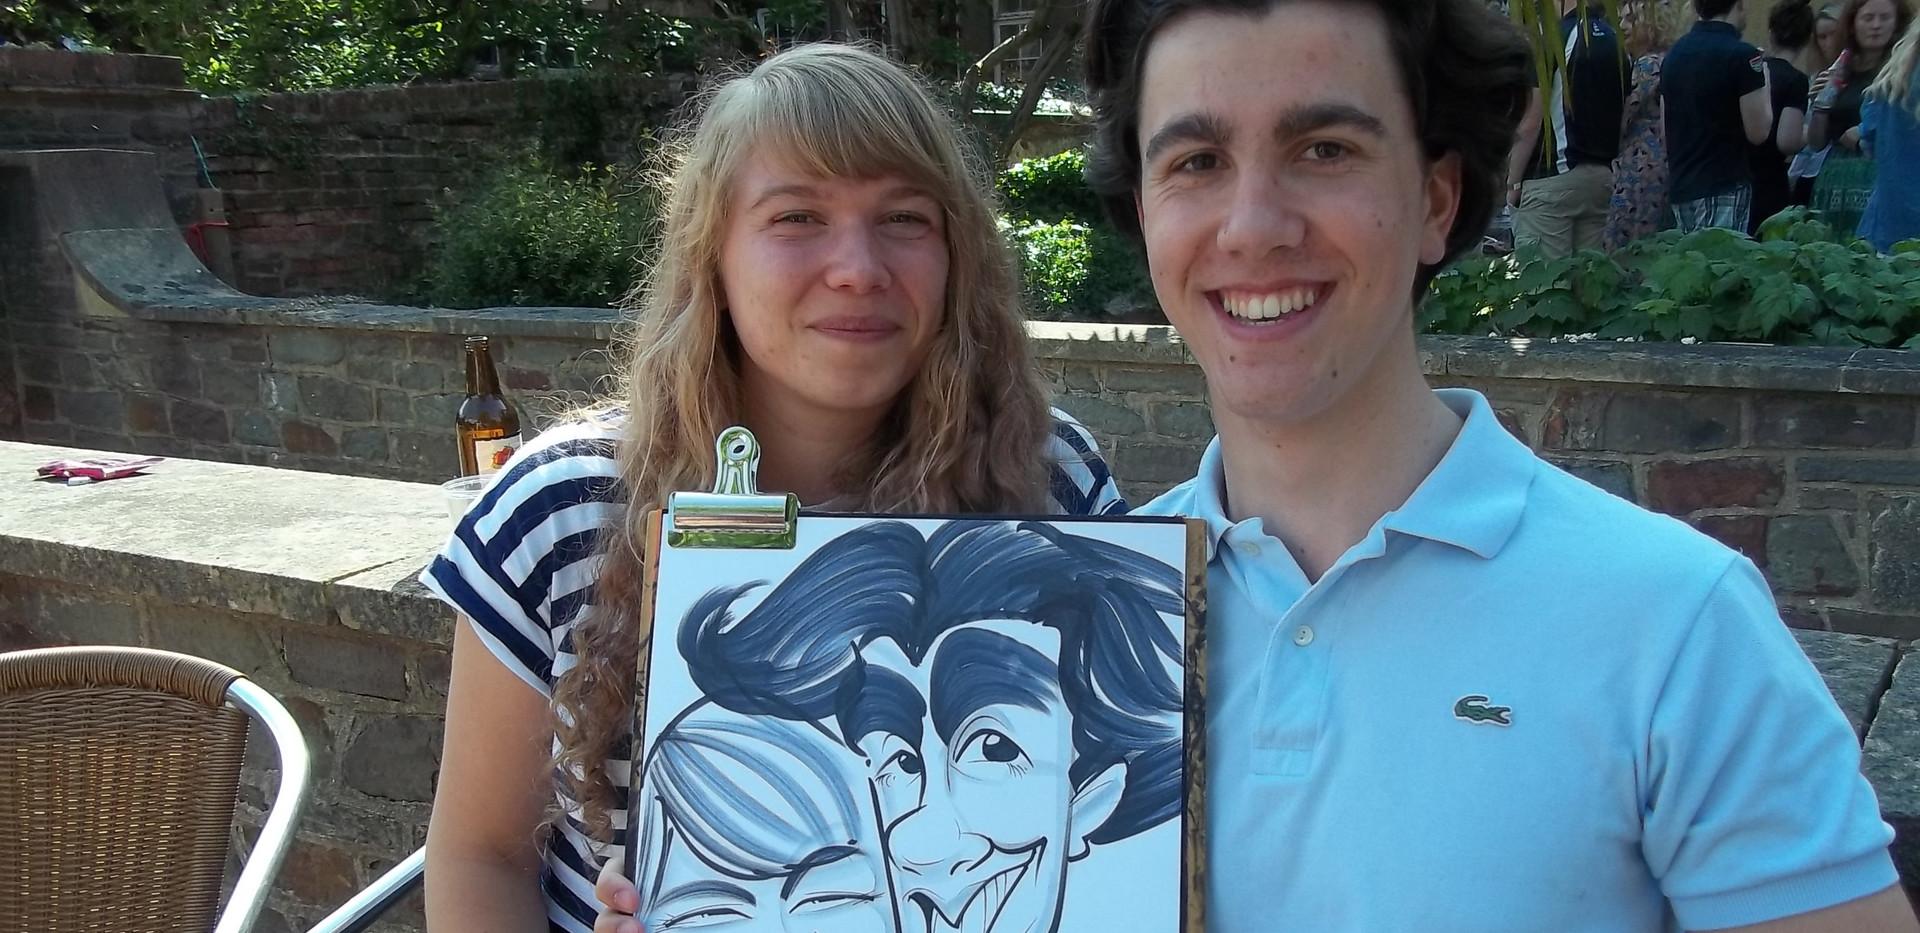 Student Event Caricatures